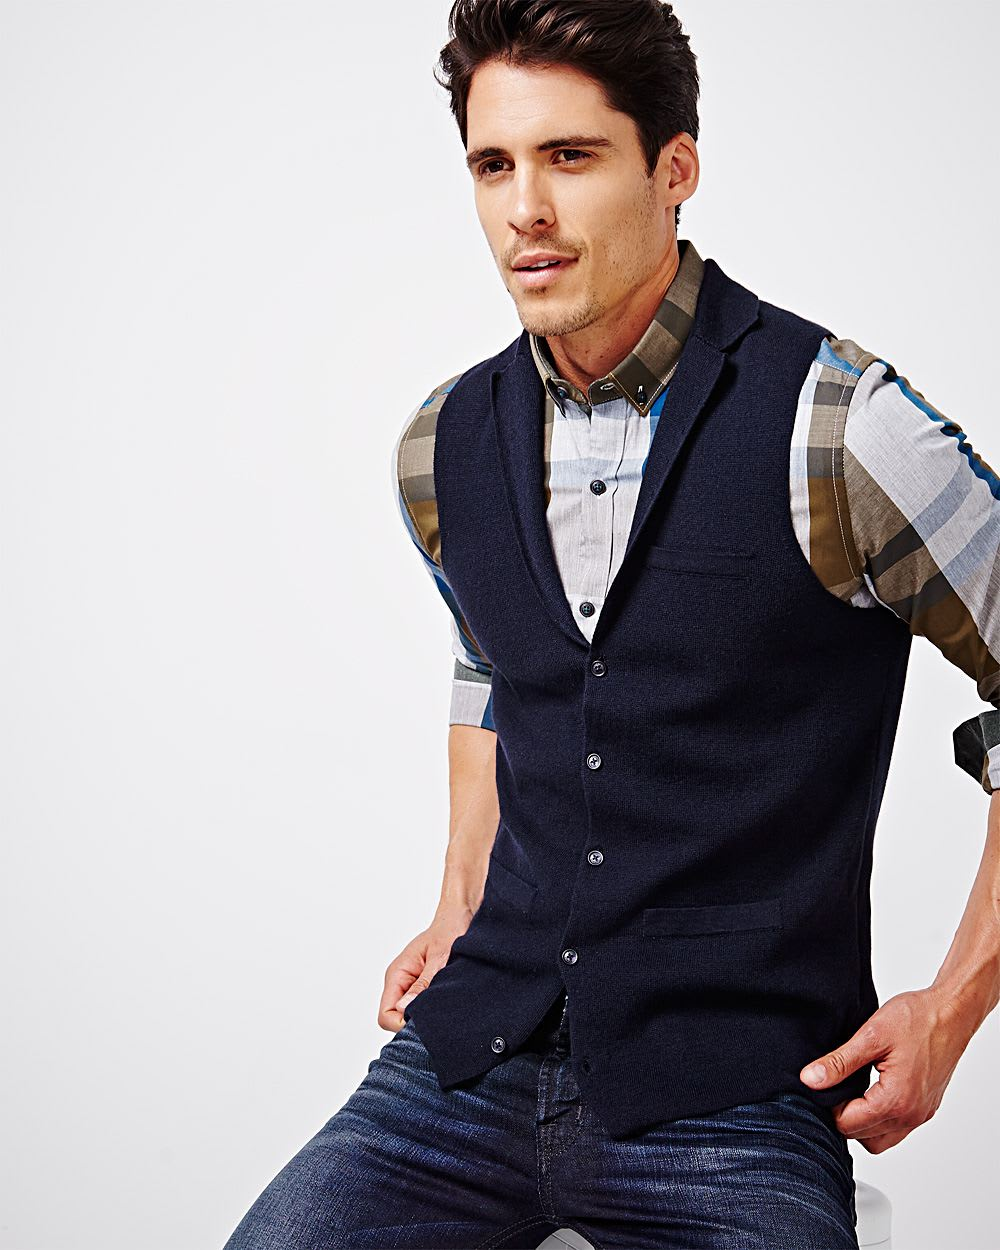 Sleeveless sweater vest   RW&CO.